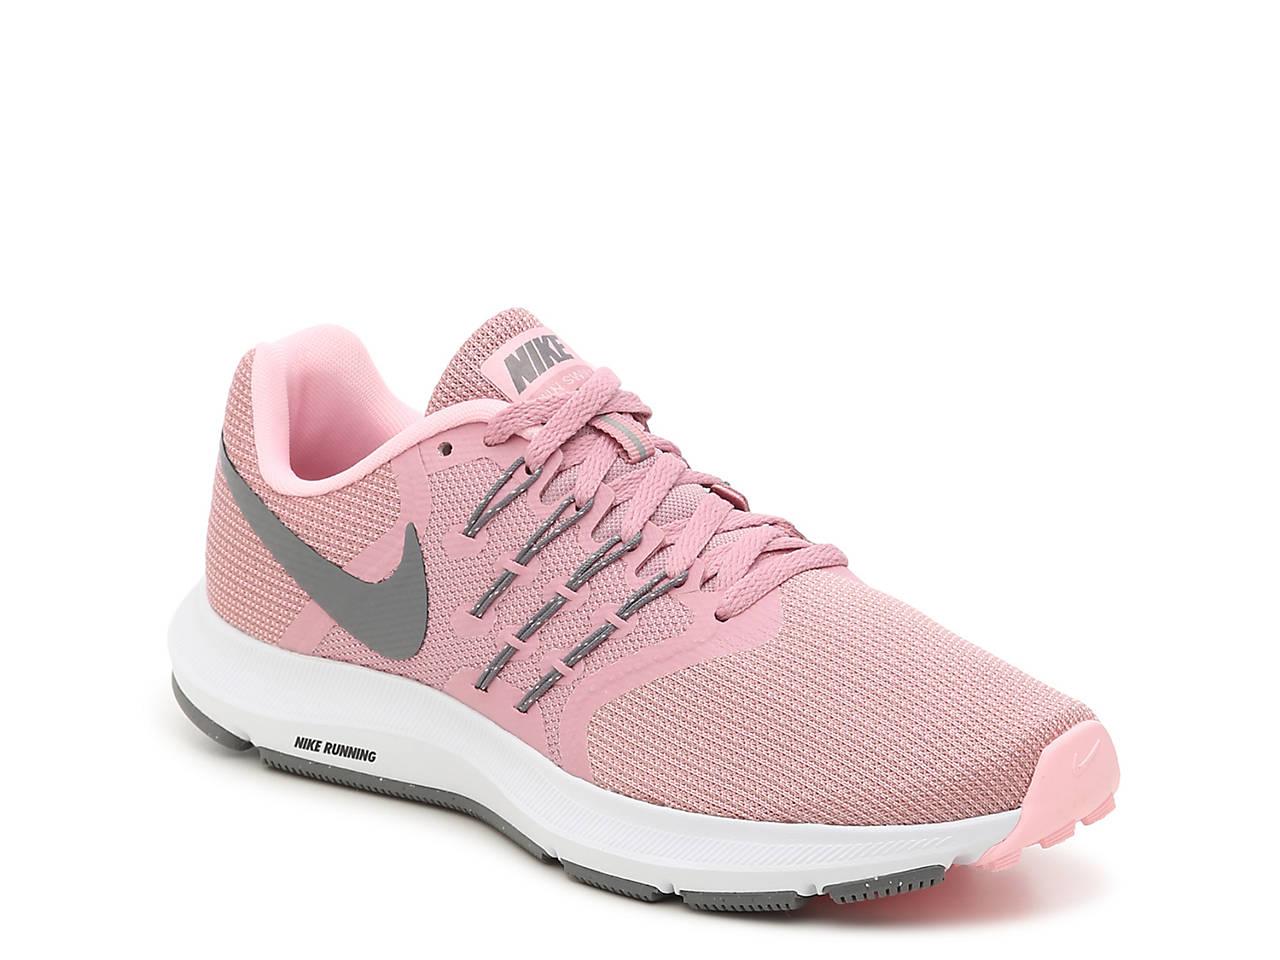 abfc7c2e56a5 ... Run Swift Lightweight Running Shoe - Womens  Womens Nike ...